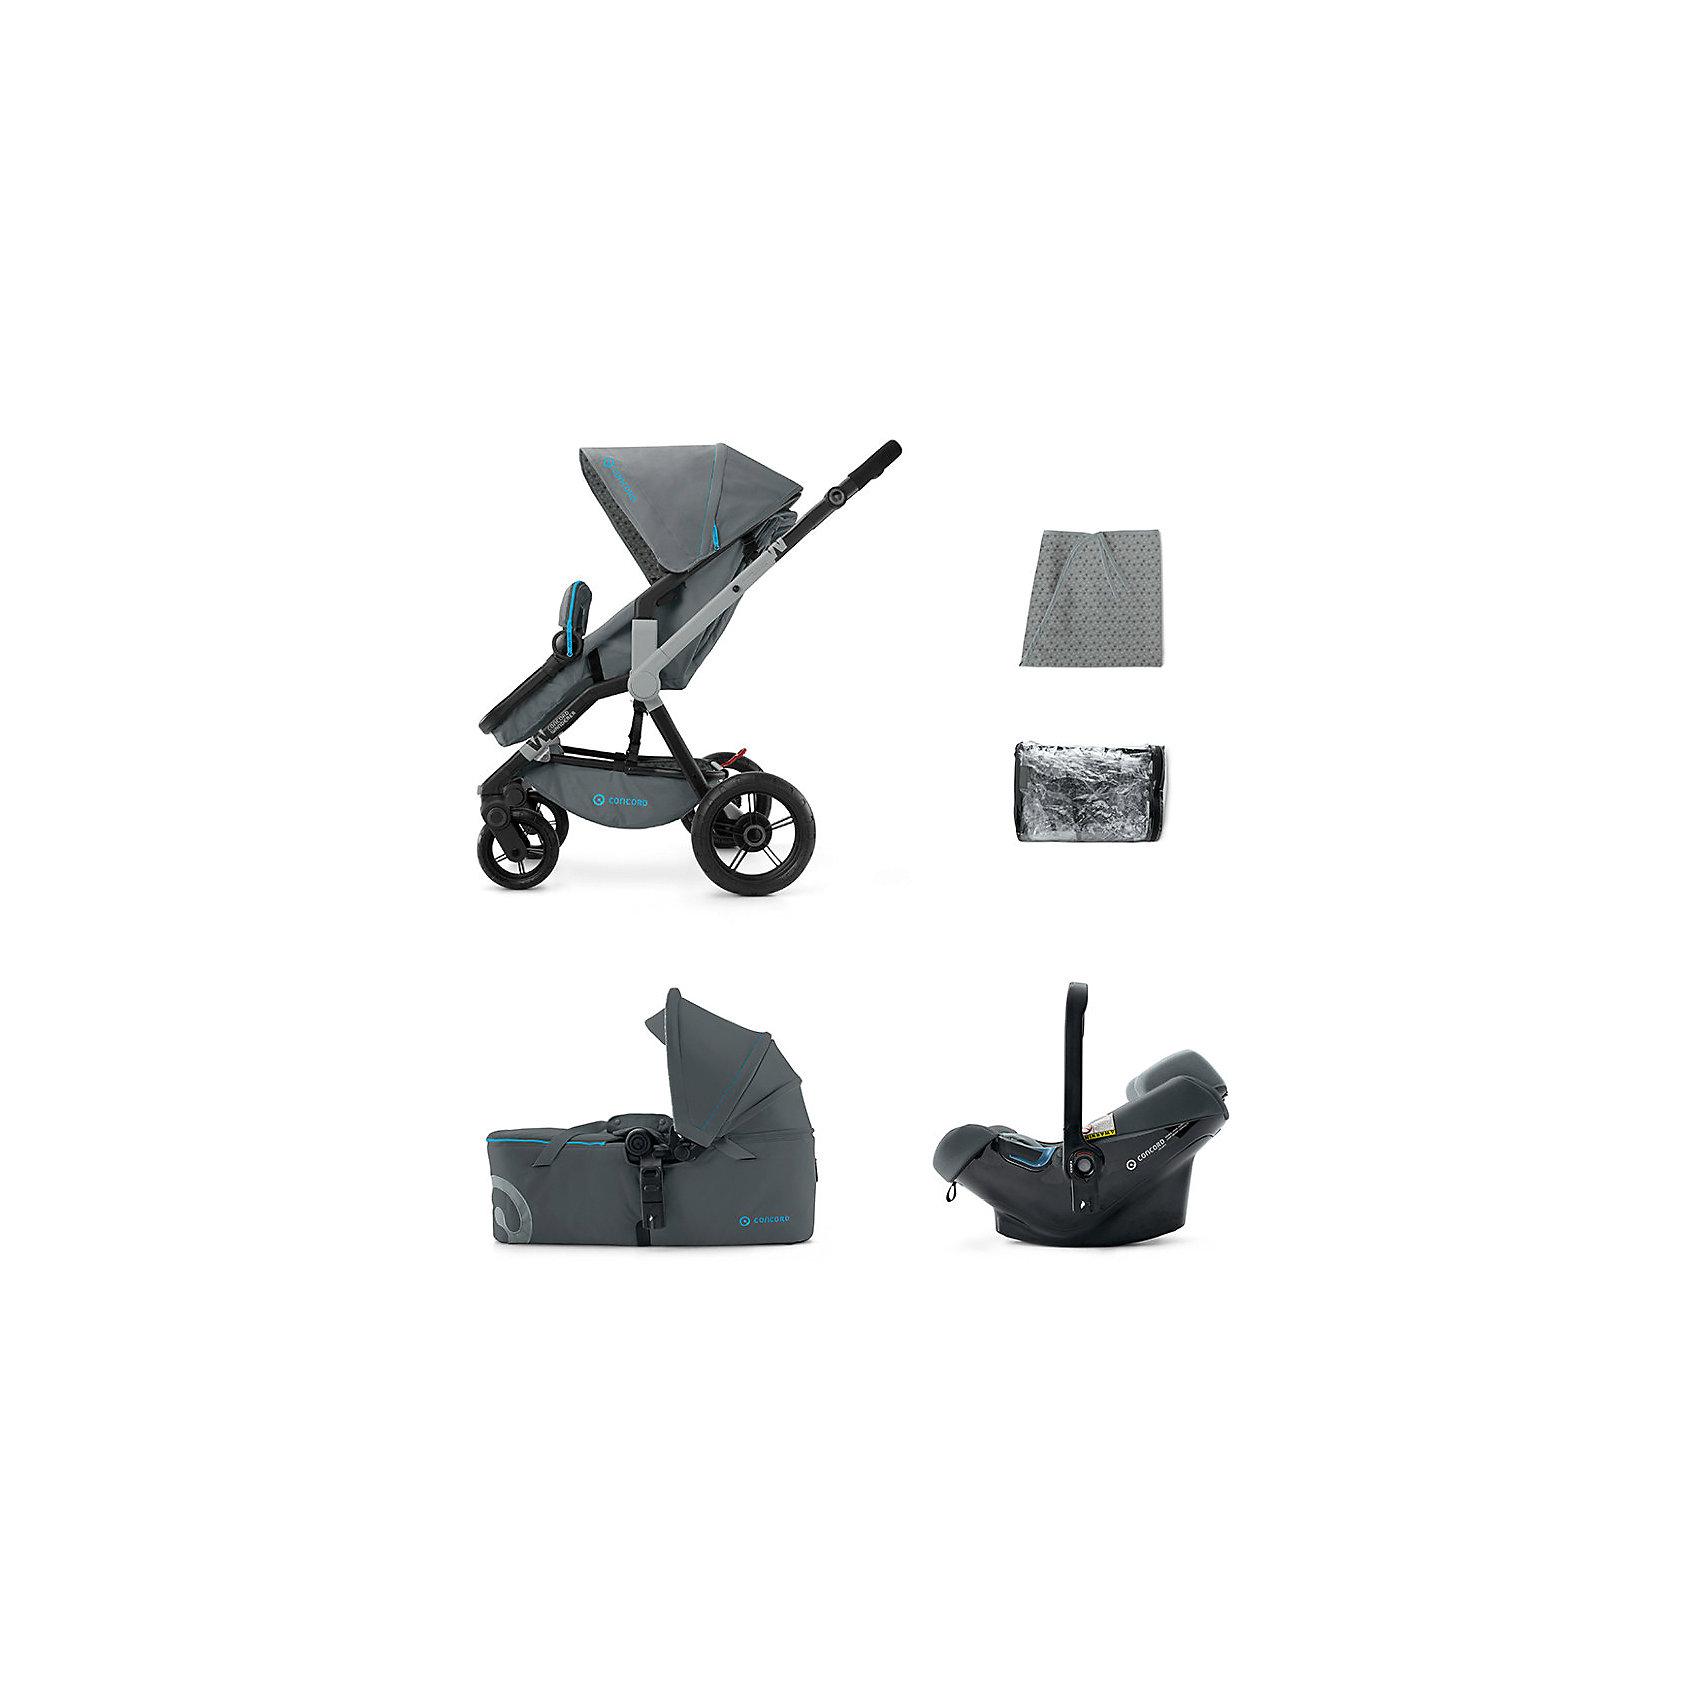 Коляска 3 в 1 Concord Wanderer Mobility Set, Stone Grey 2015